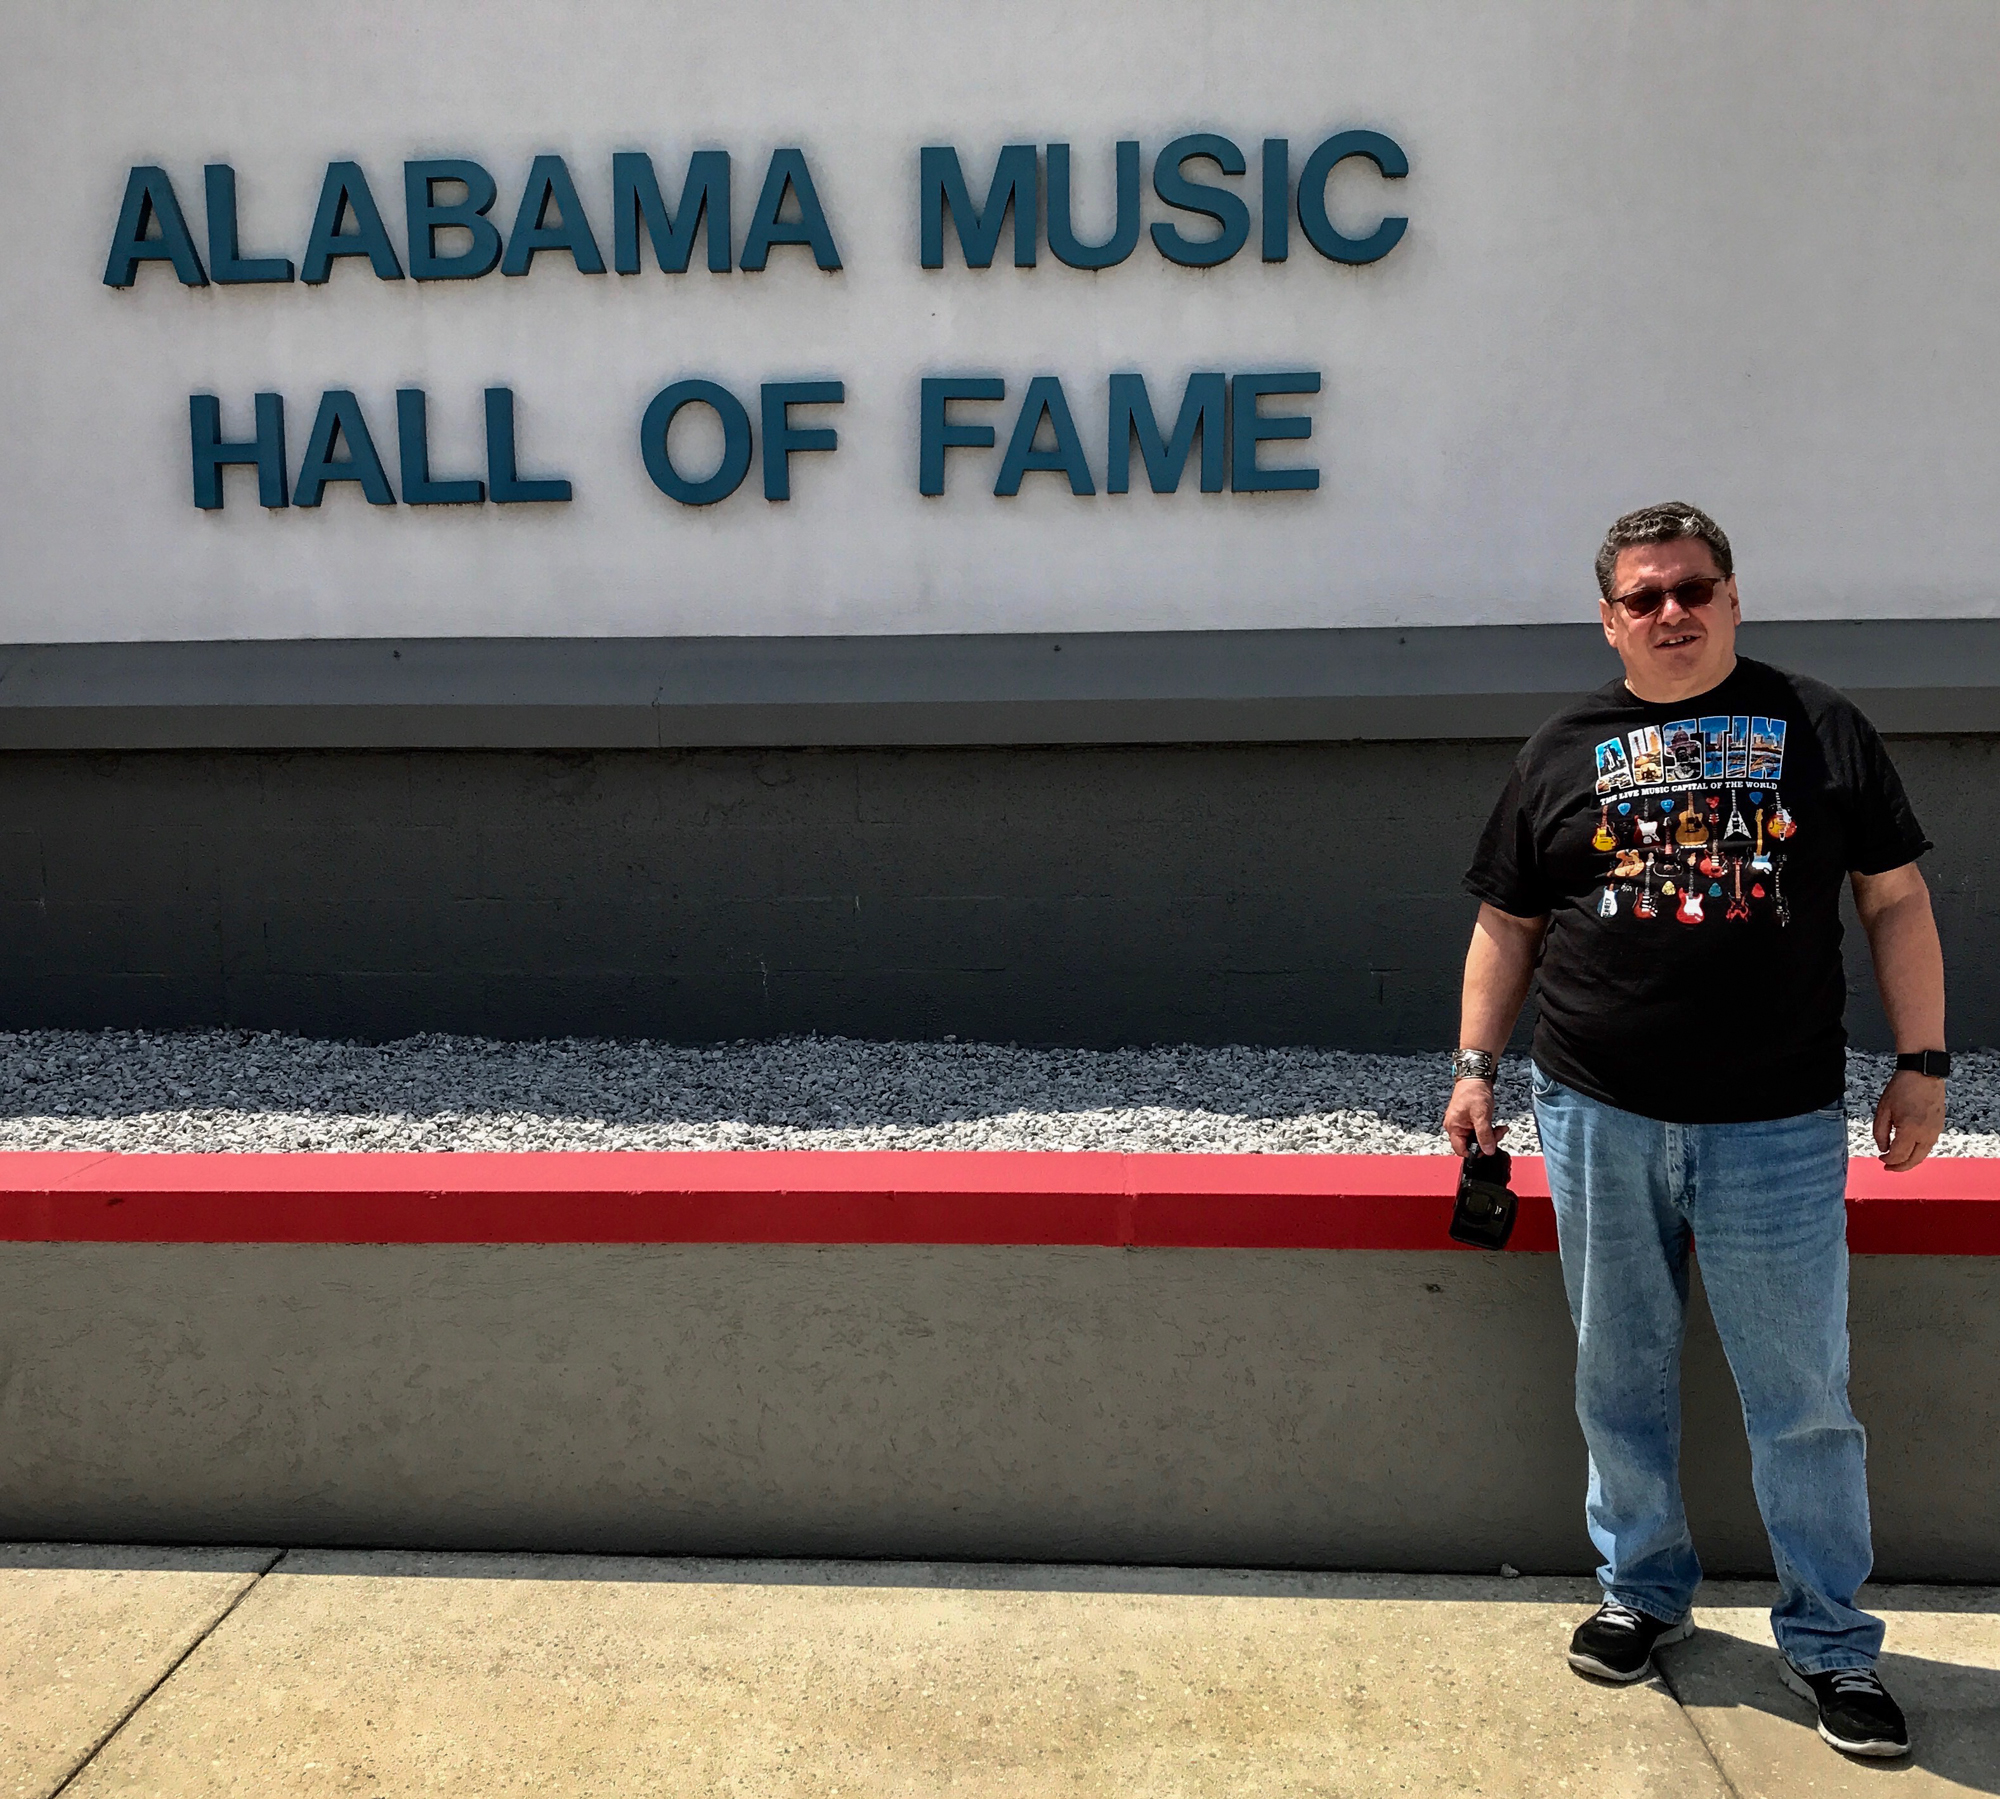 Alabama Music Hall of Fame AL